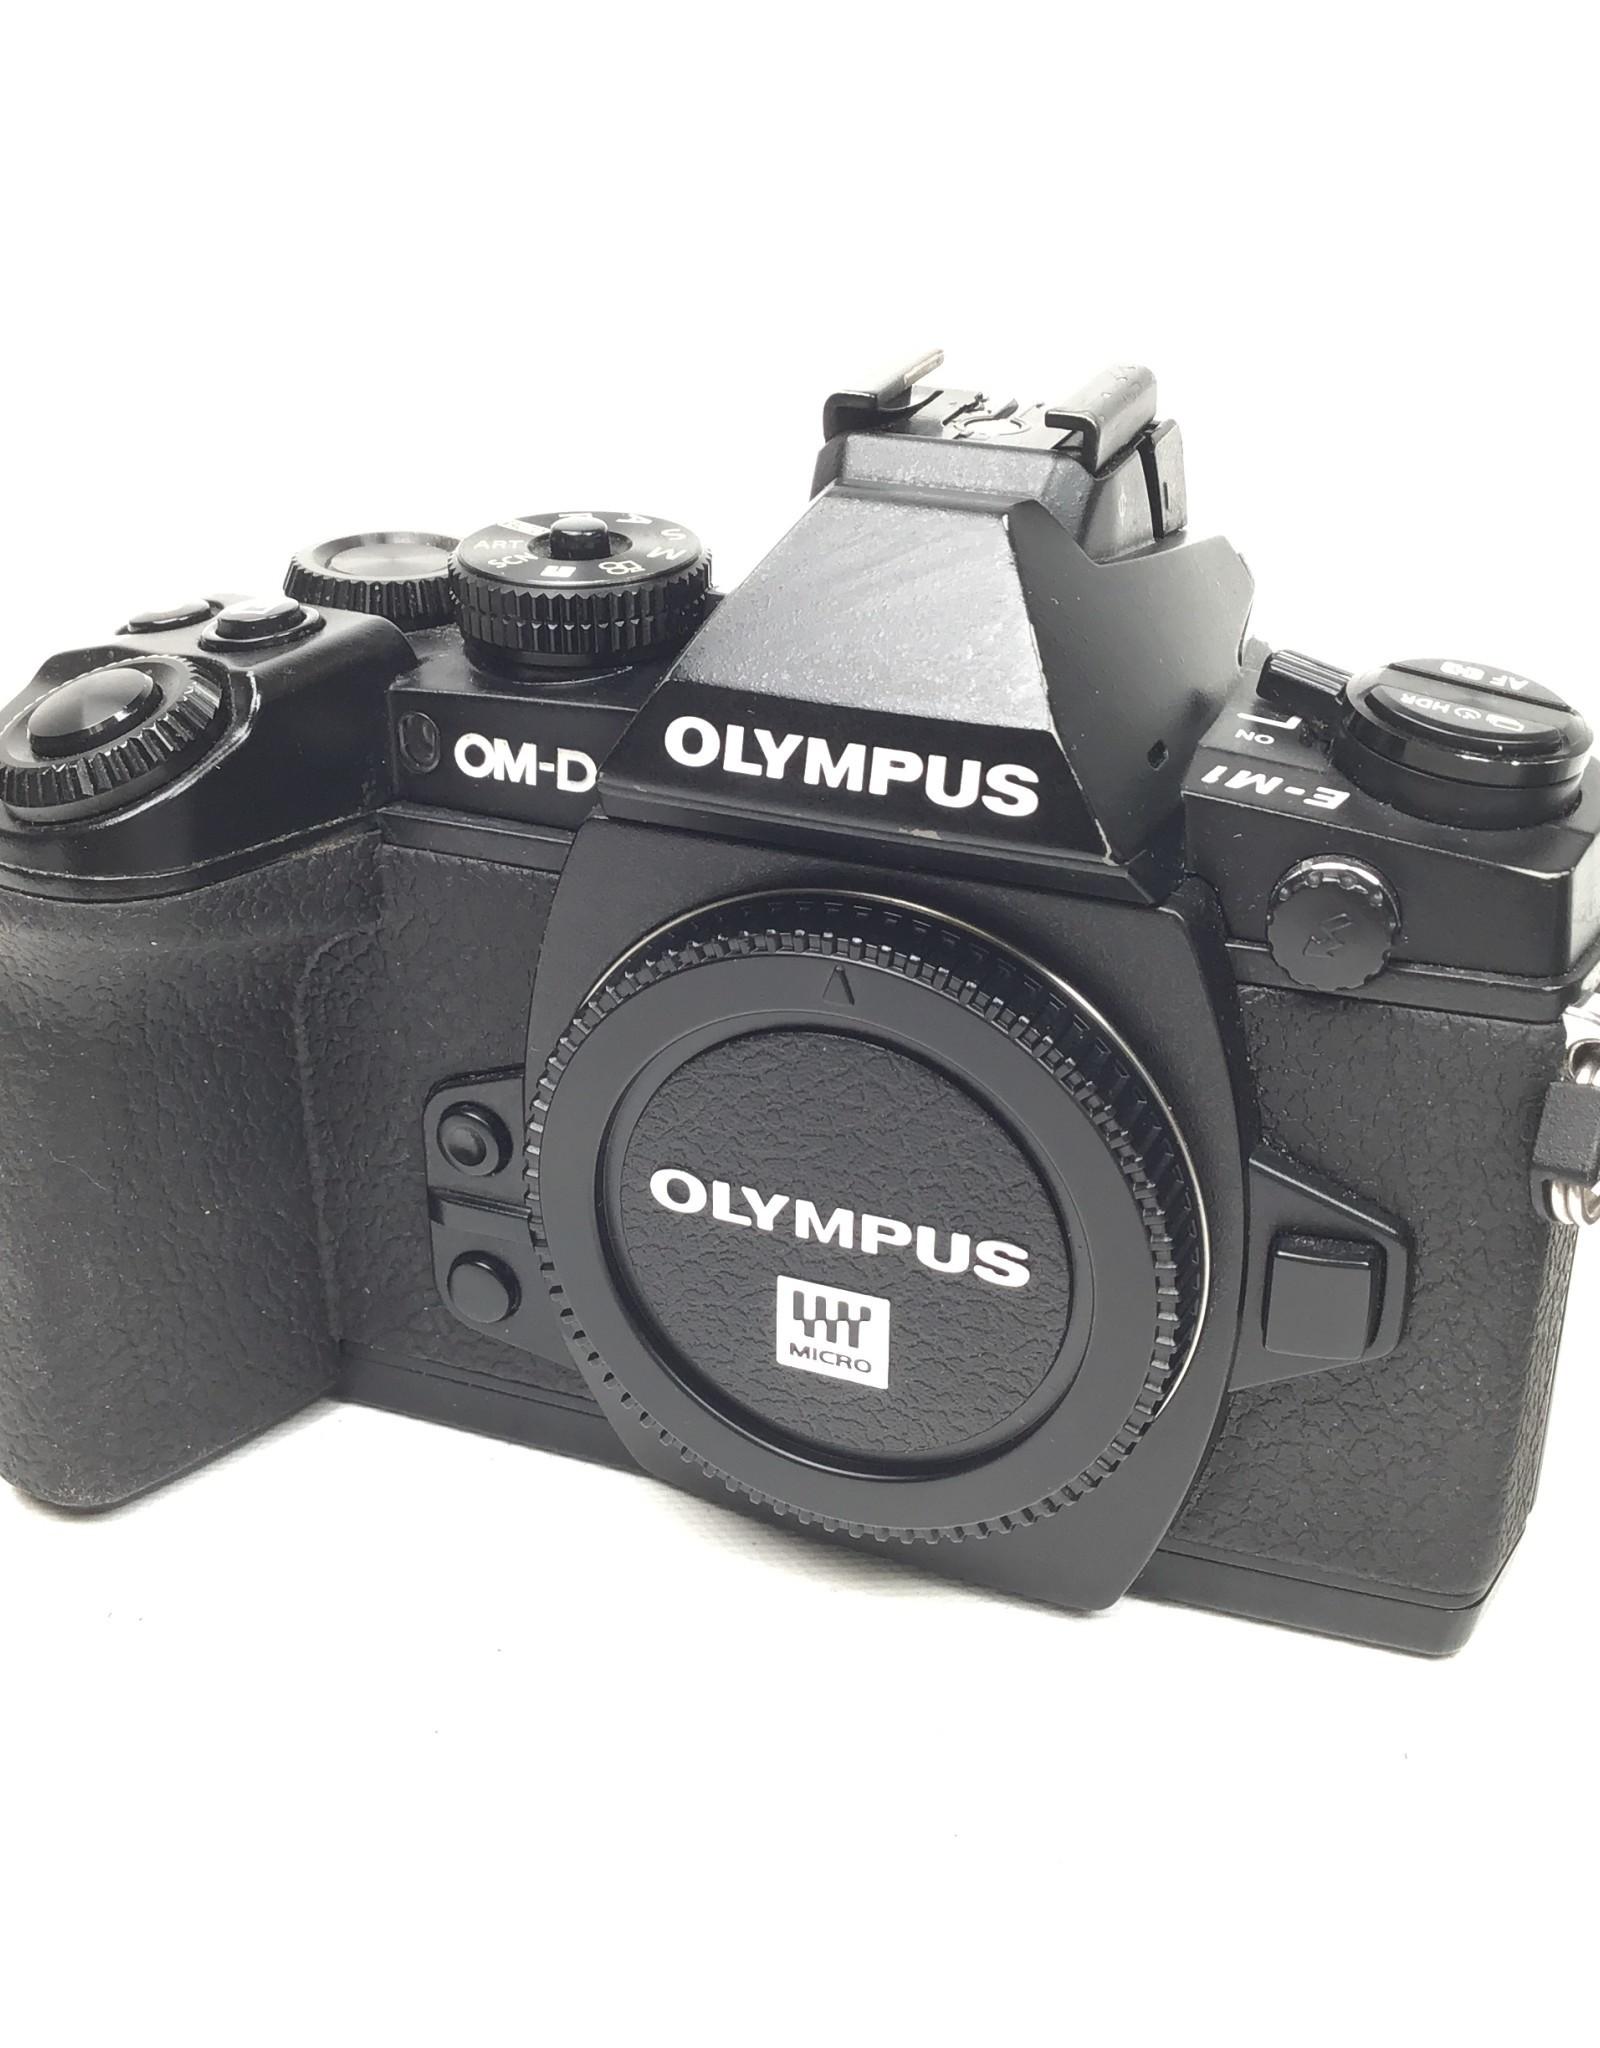 OLYMPUS Olympus OM-D E-M1 Black Camera Used Fair